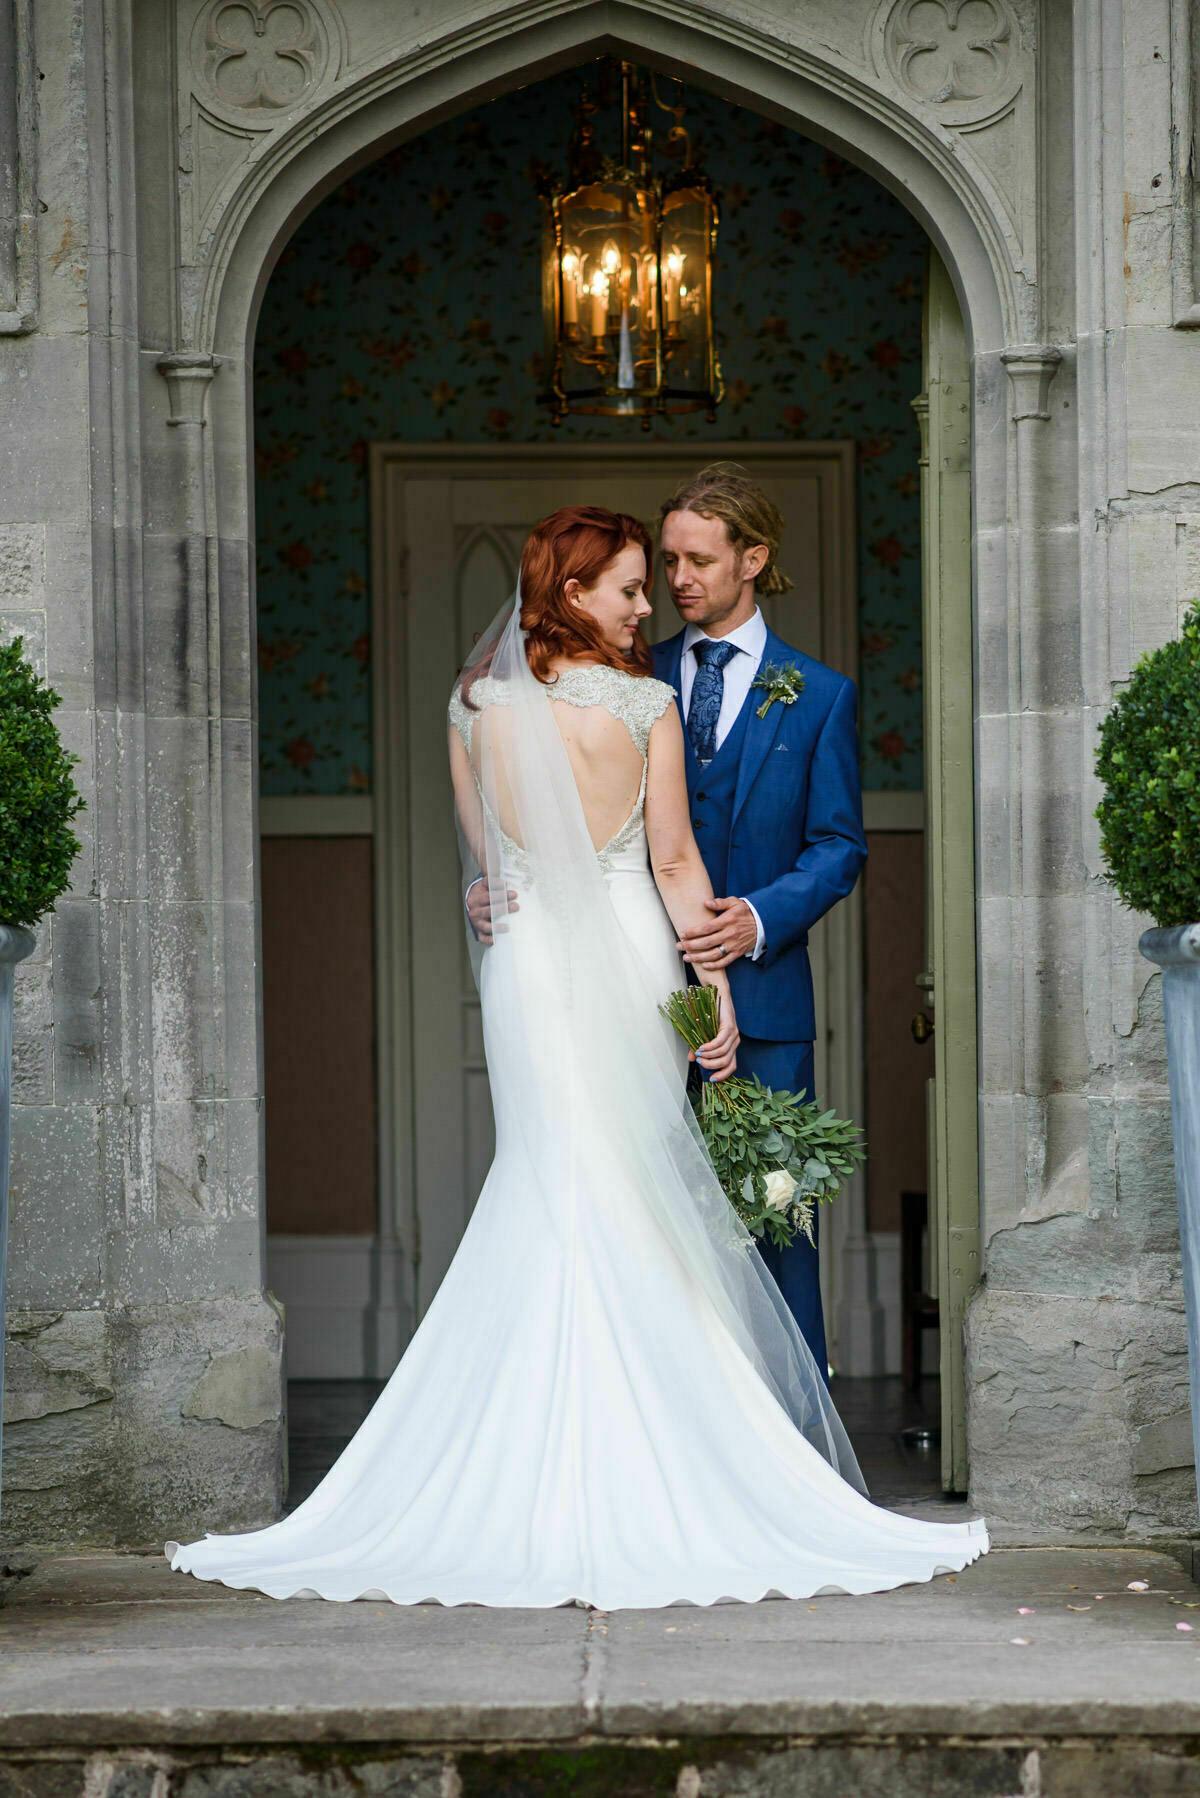 Lemore Manor weddings